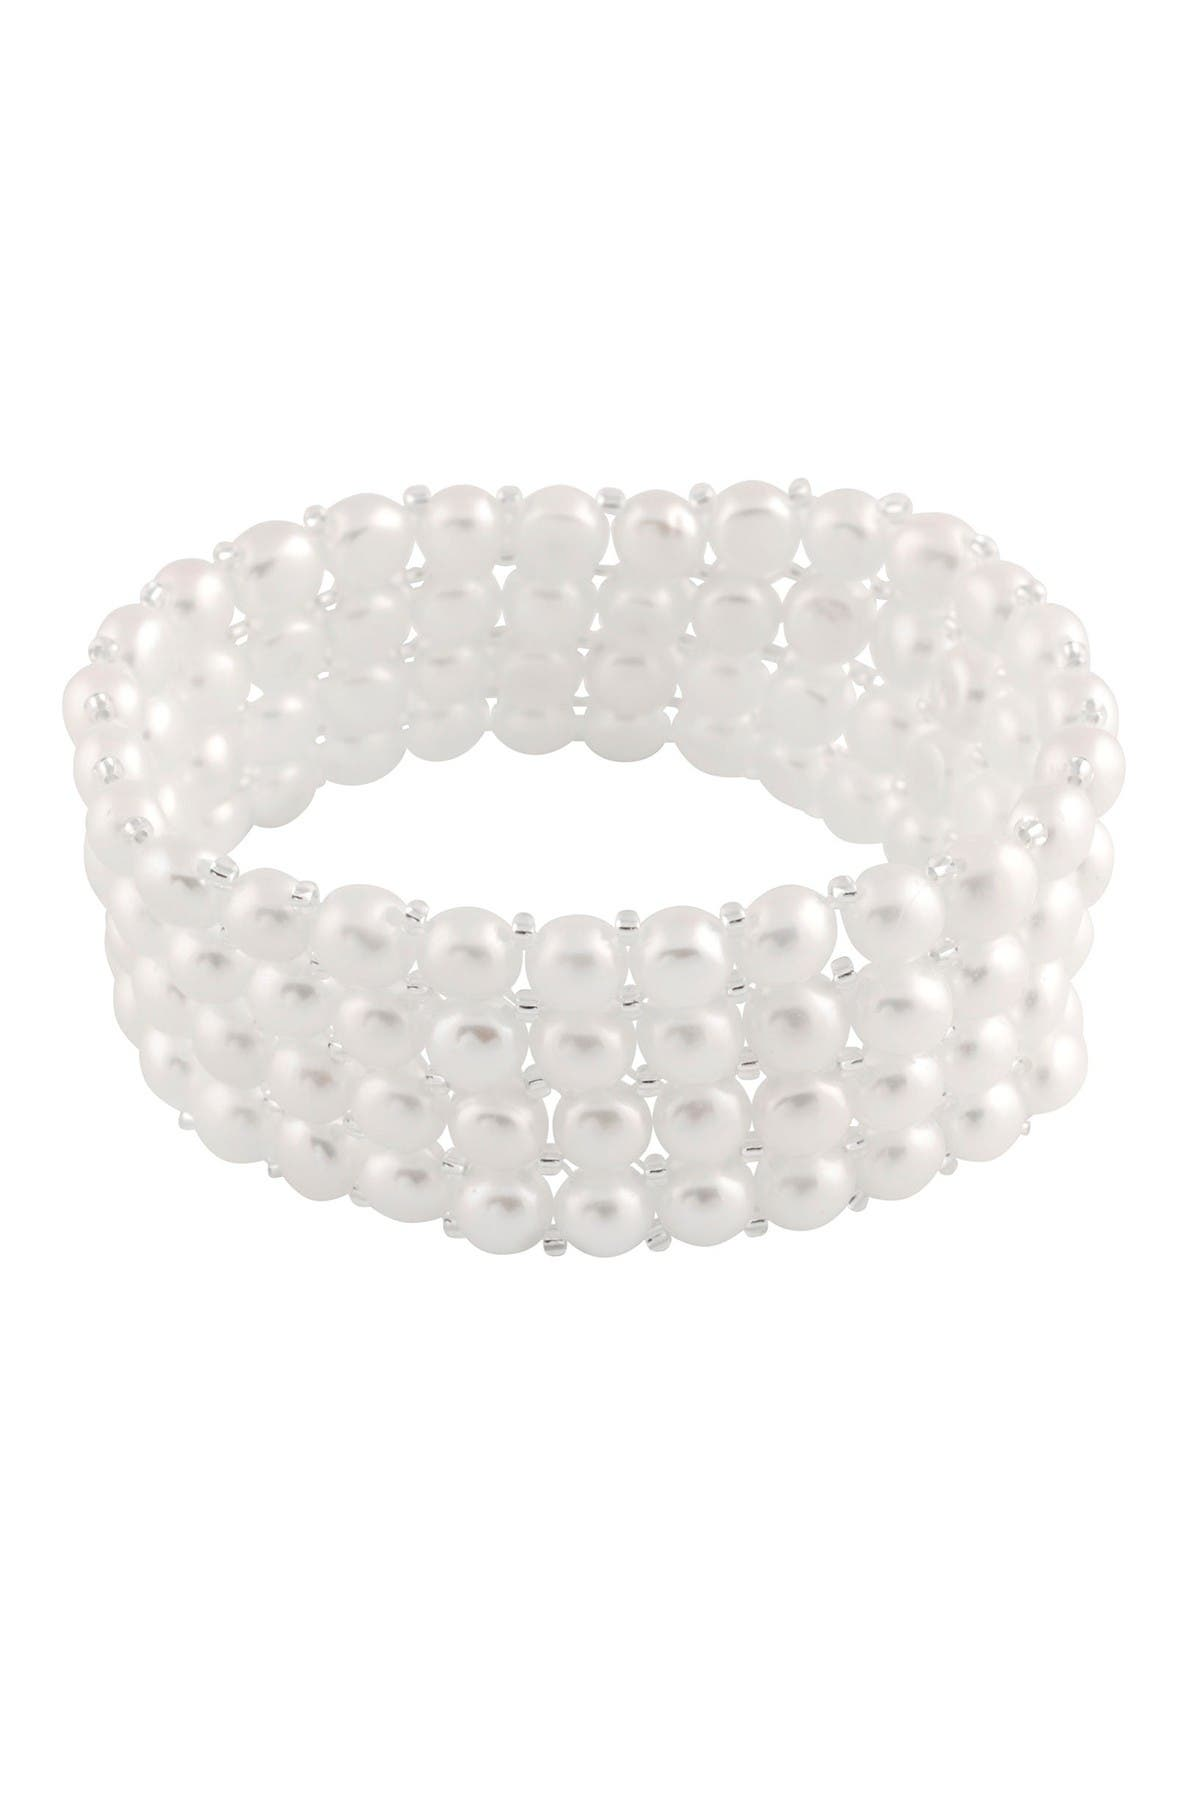 Image of Splendid Pearls 6-7mm Cultured White Freshwater Pearl Quad Row Elastic Bracelet